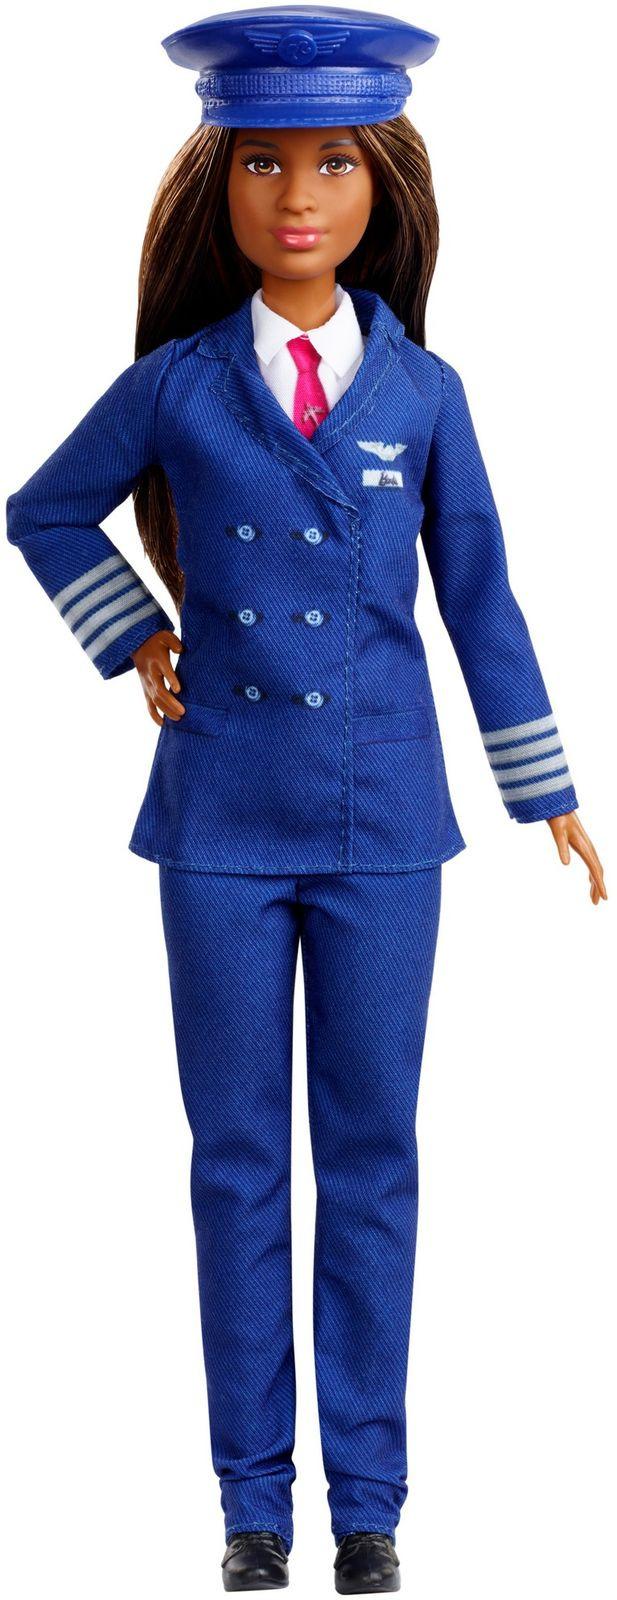 Кукла Barbie Кем быть? Пилот, к 60-летию, GFX23_GFX25